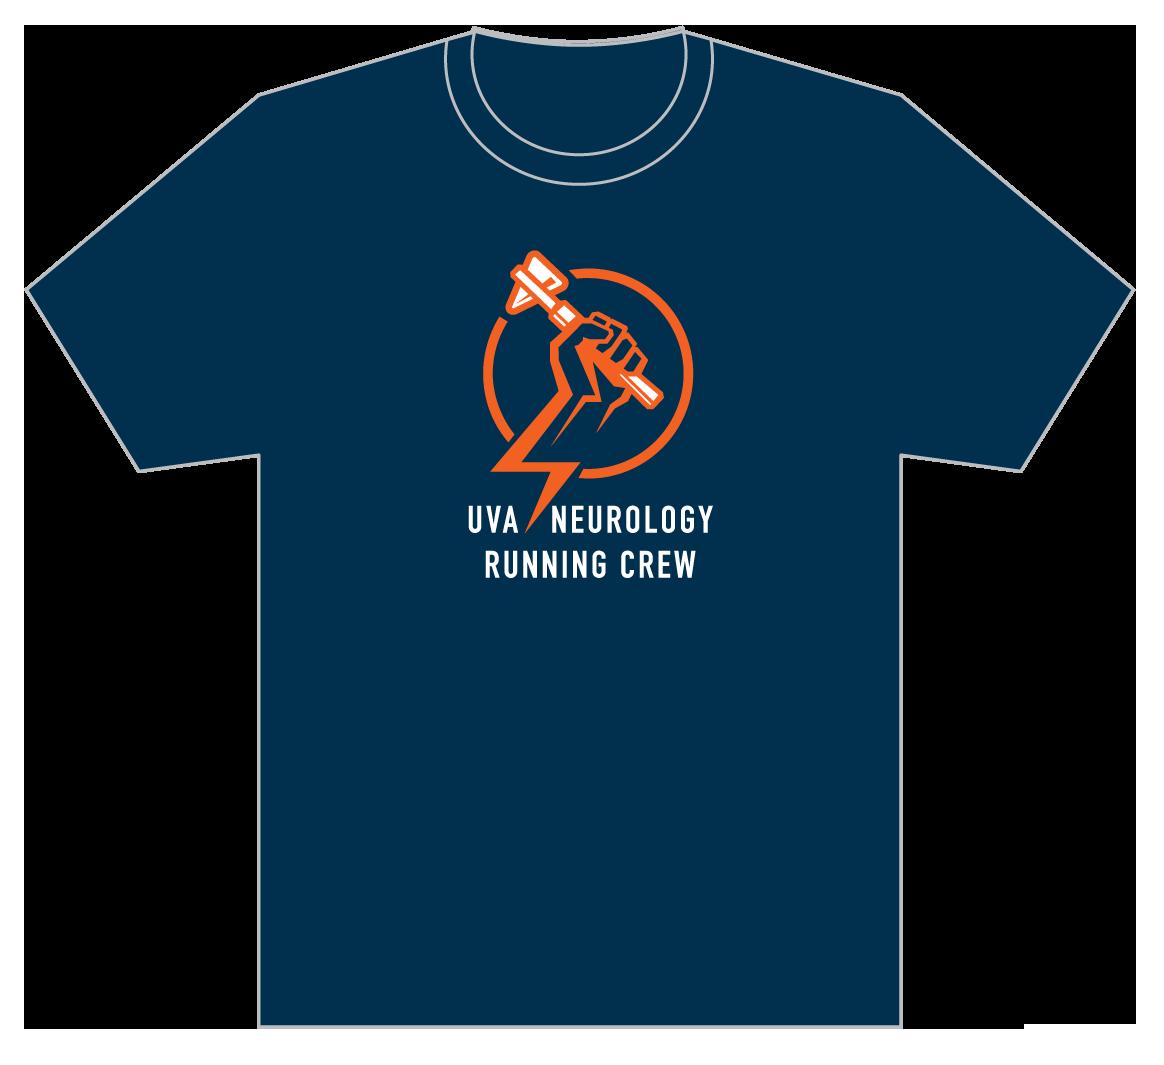 UVA Neurology Shirt 10_18_2018_OLT_A2 copy.png